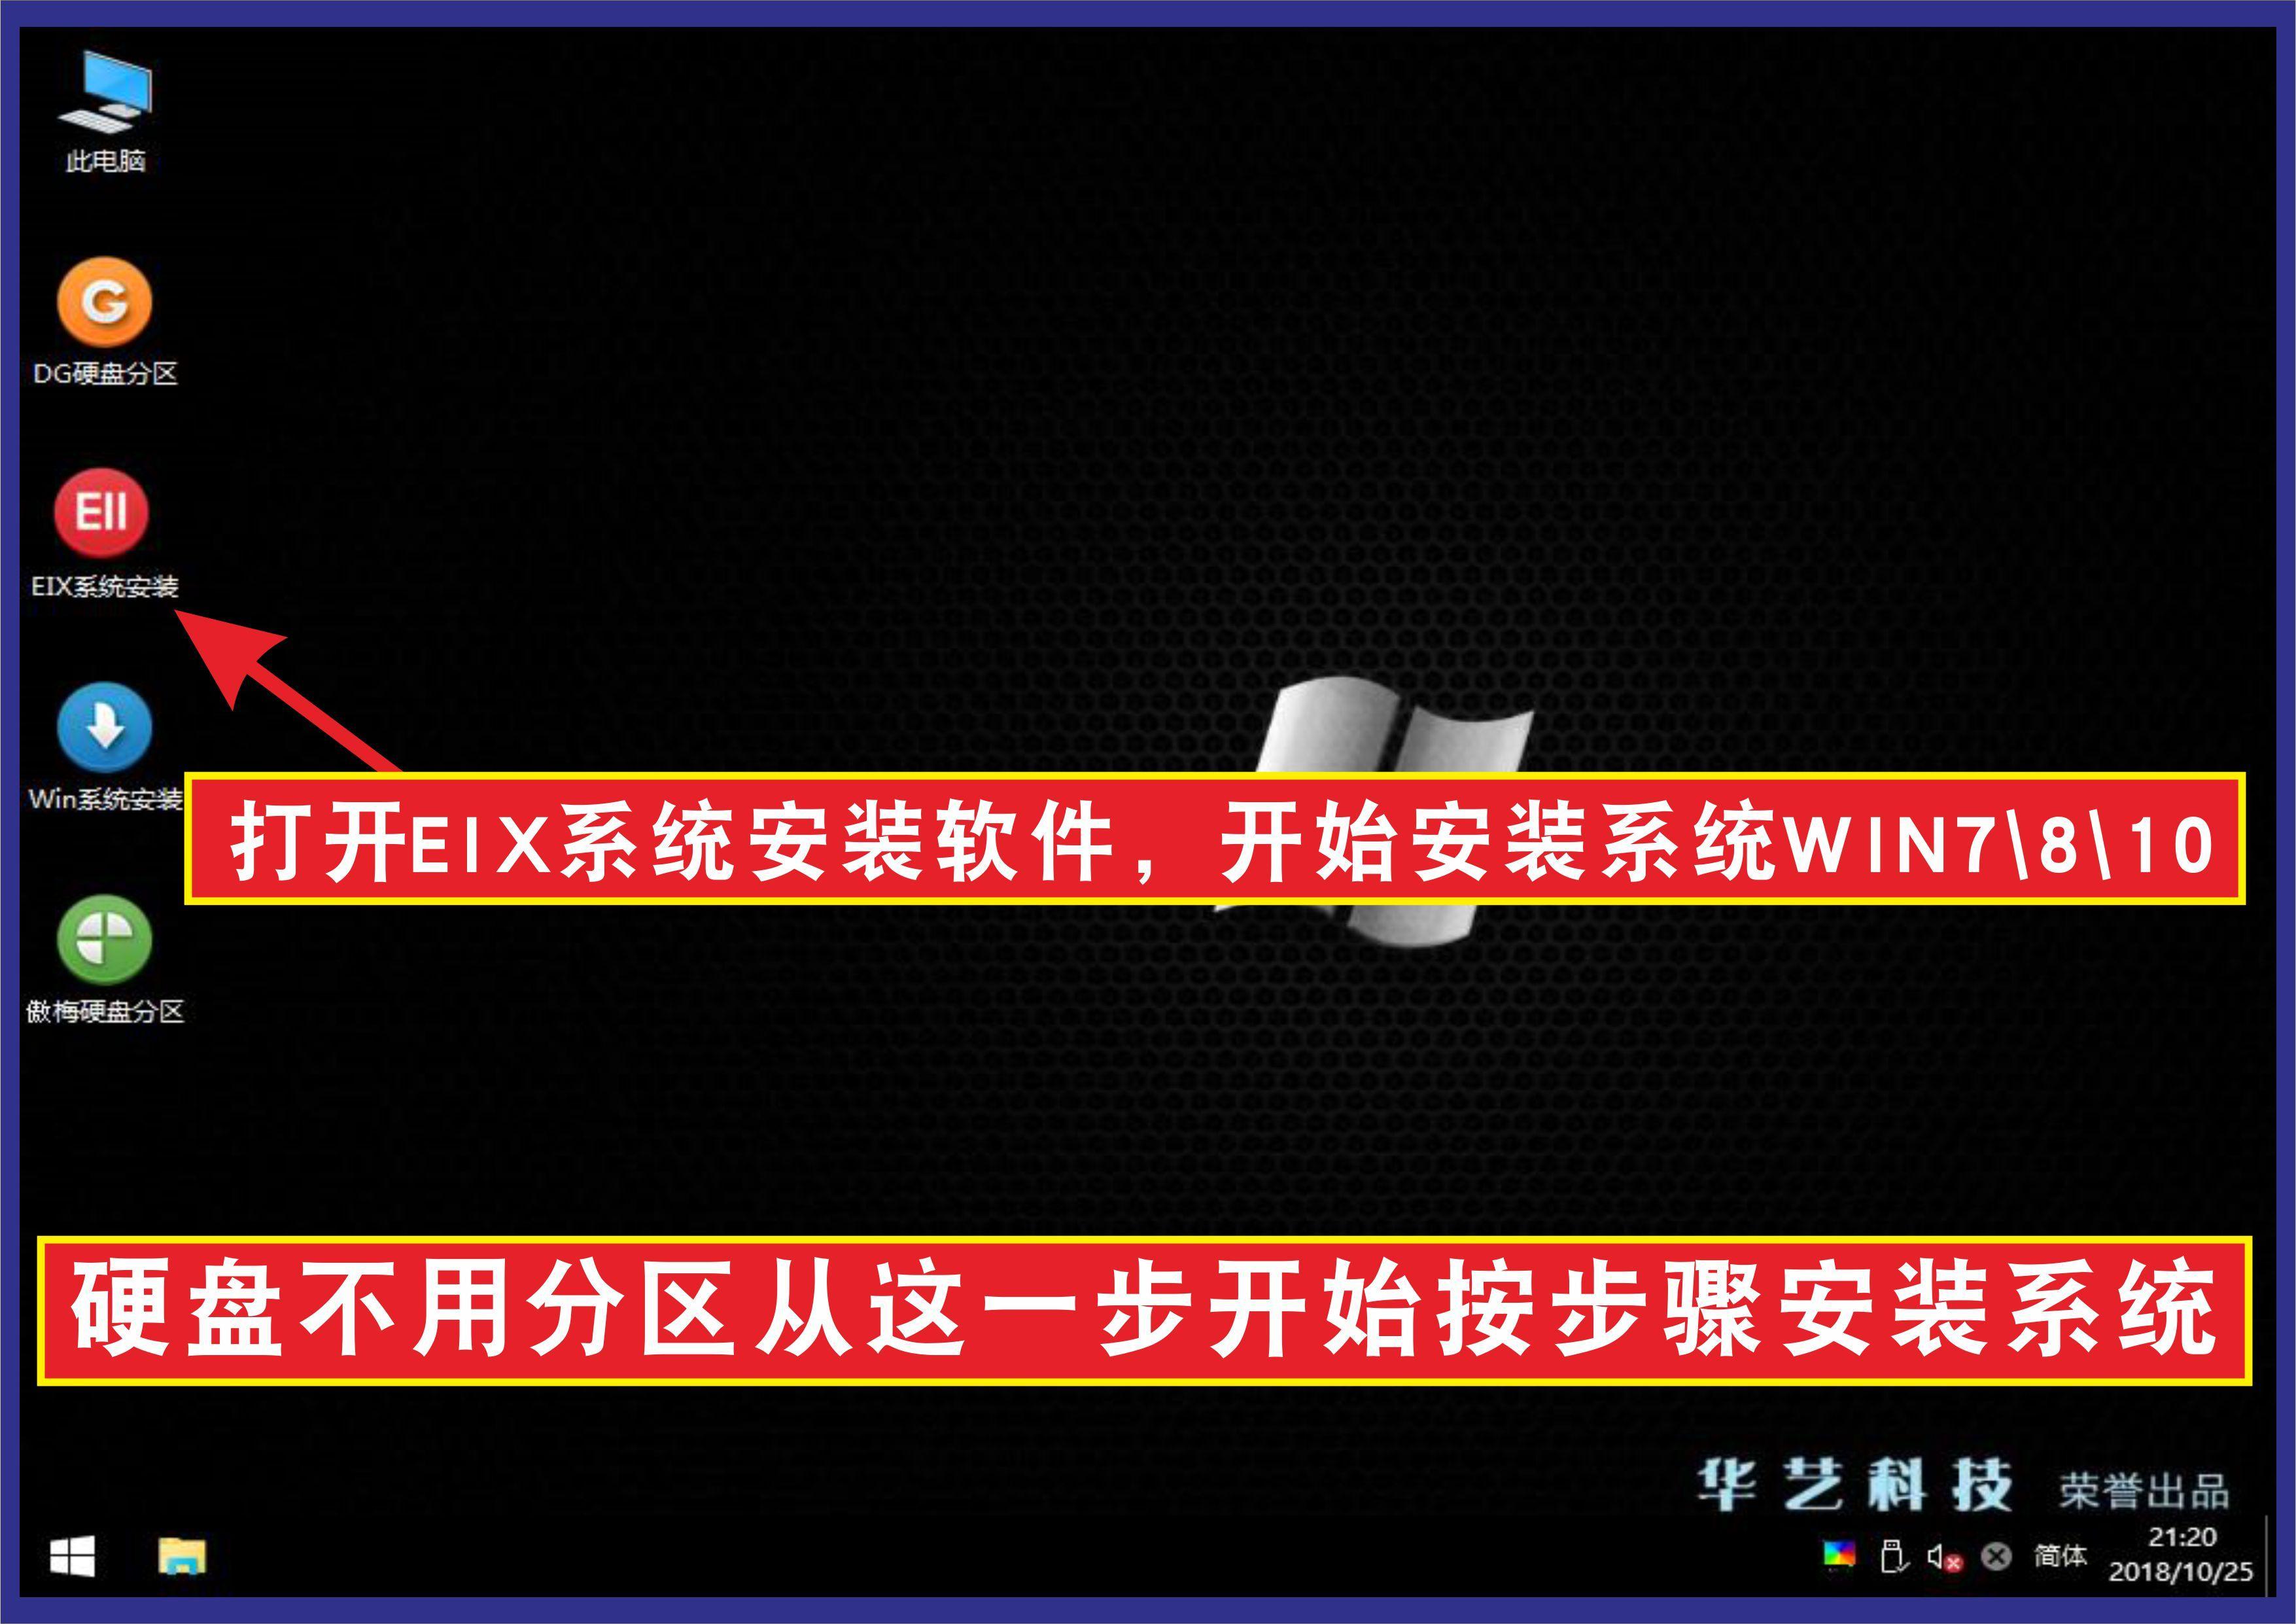 Windows7原版方法安装系统苯甲酸的制备步骤具体教程图片